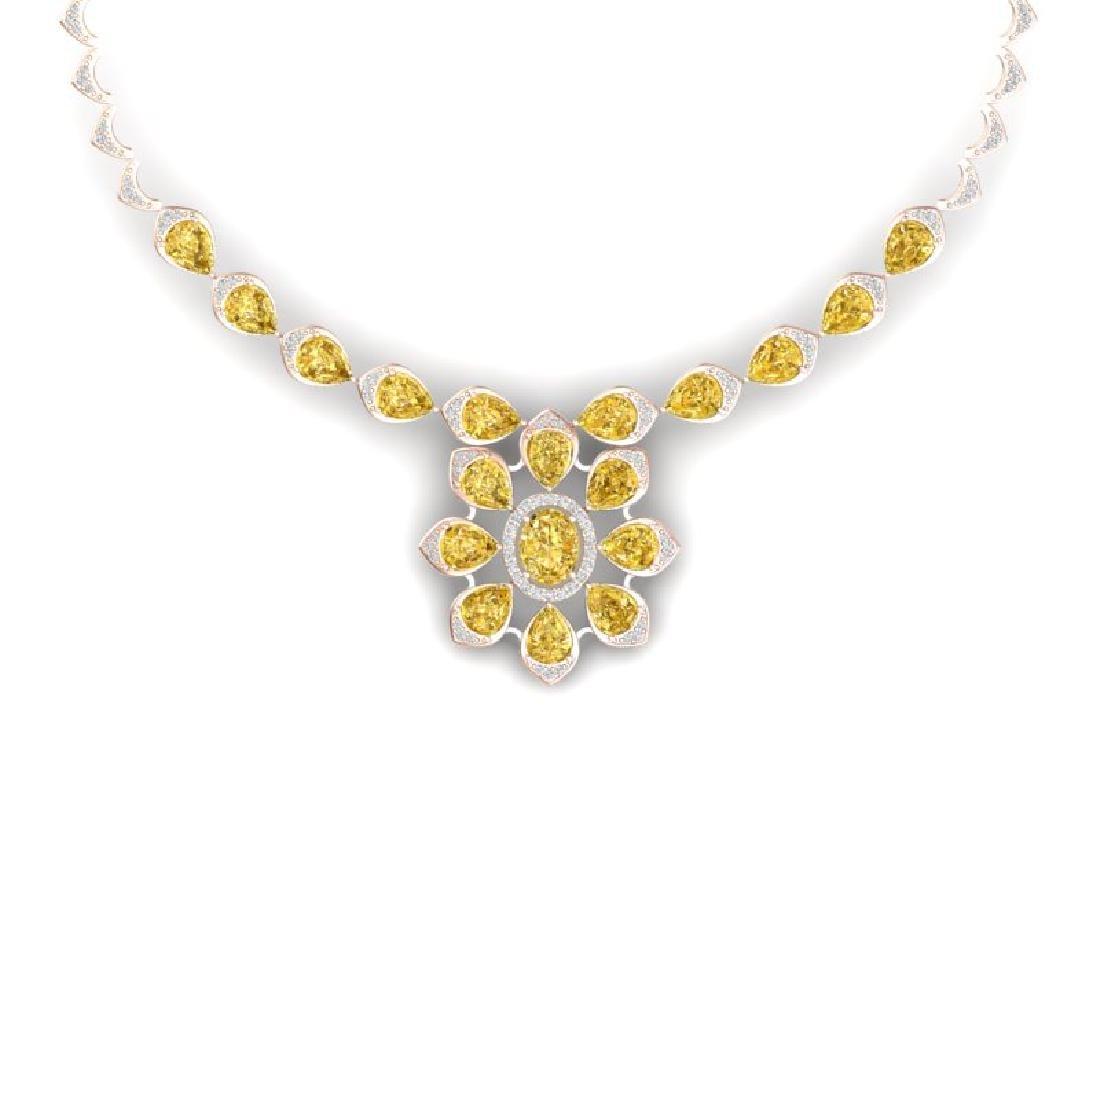 28.51 CTW Royalty Canary Citrine & VS Diamond Necklace